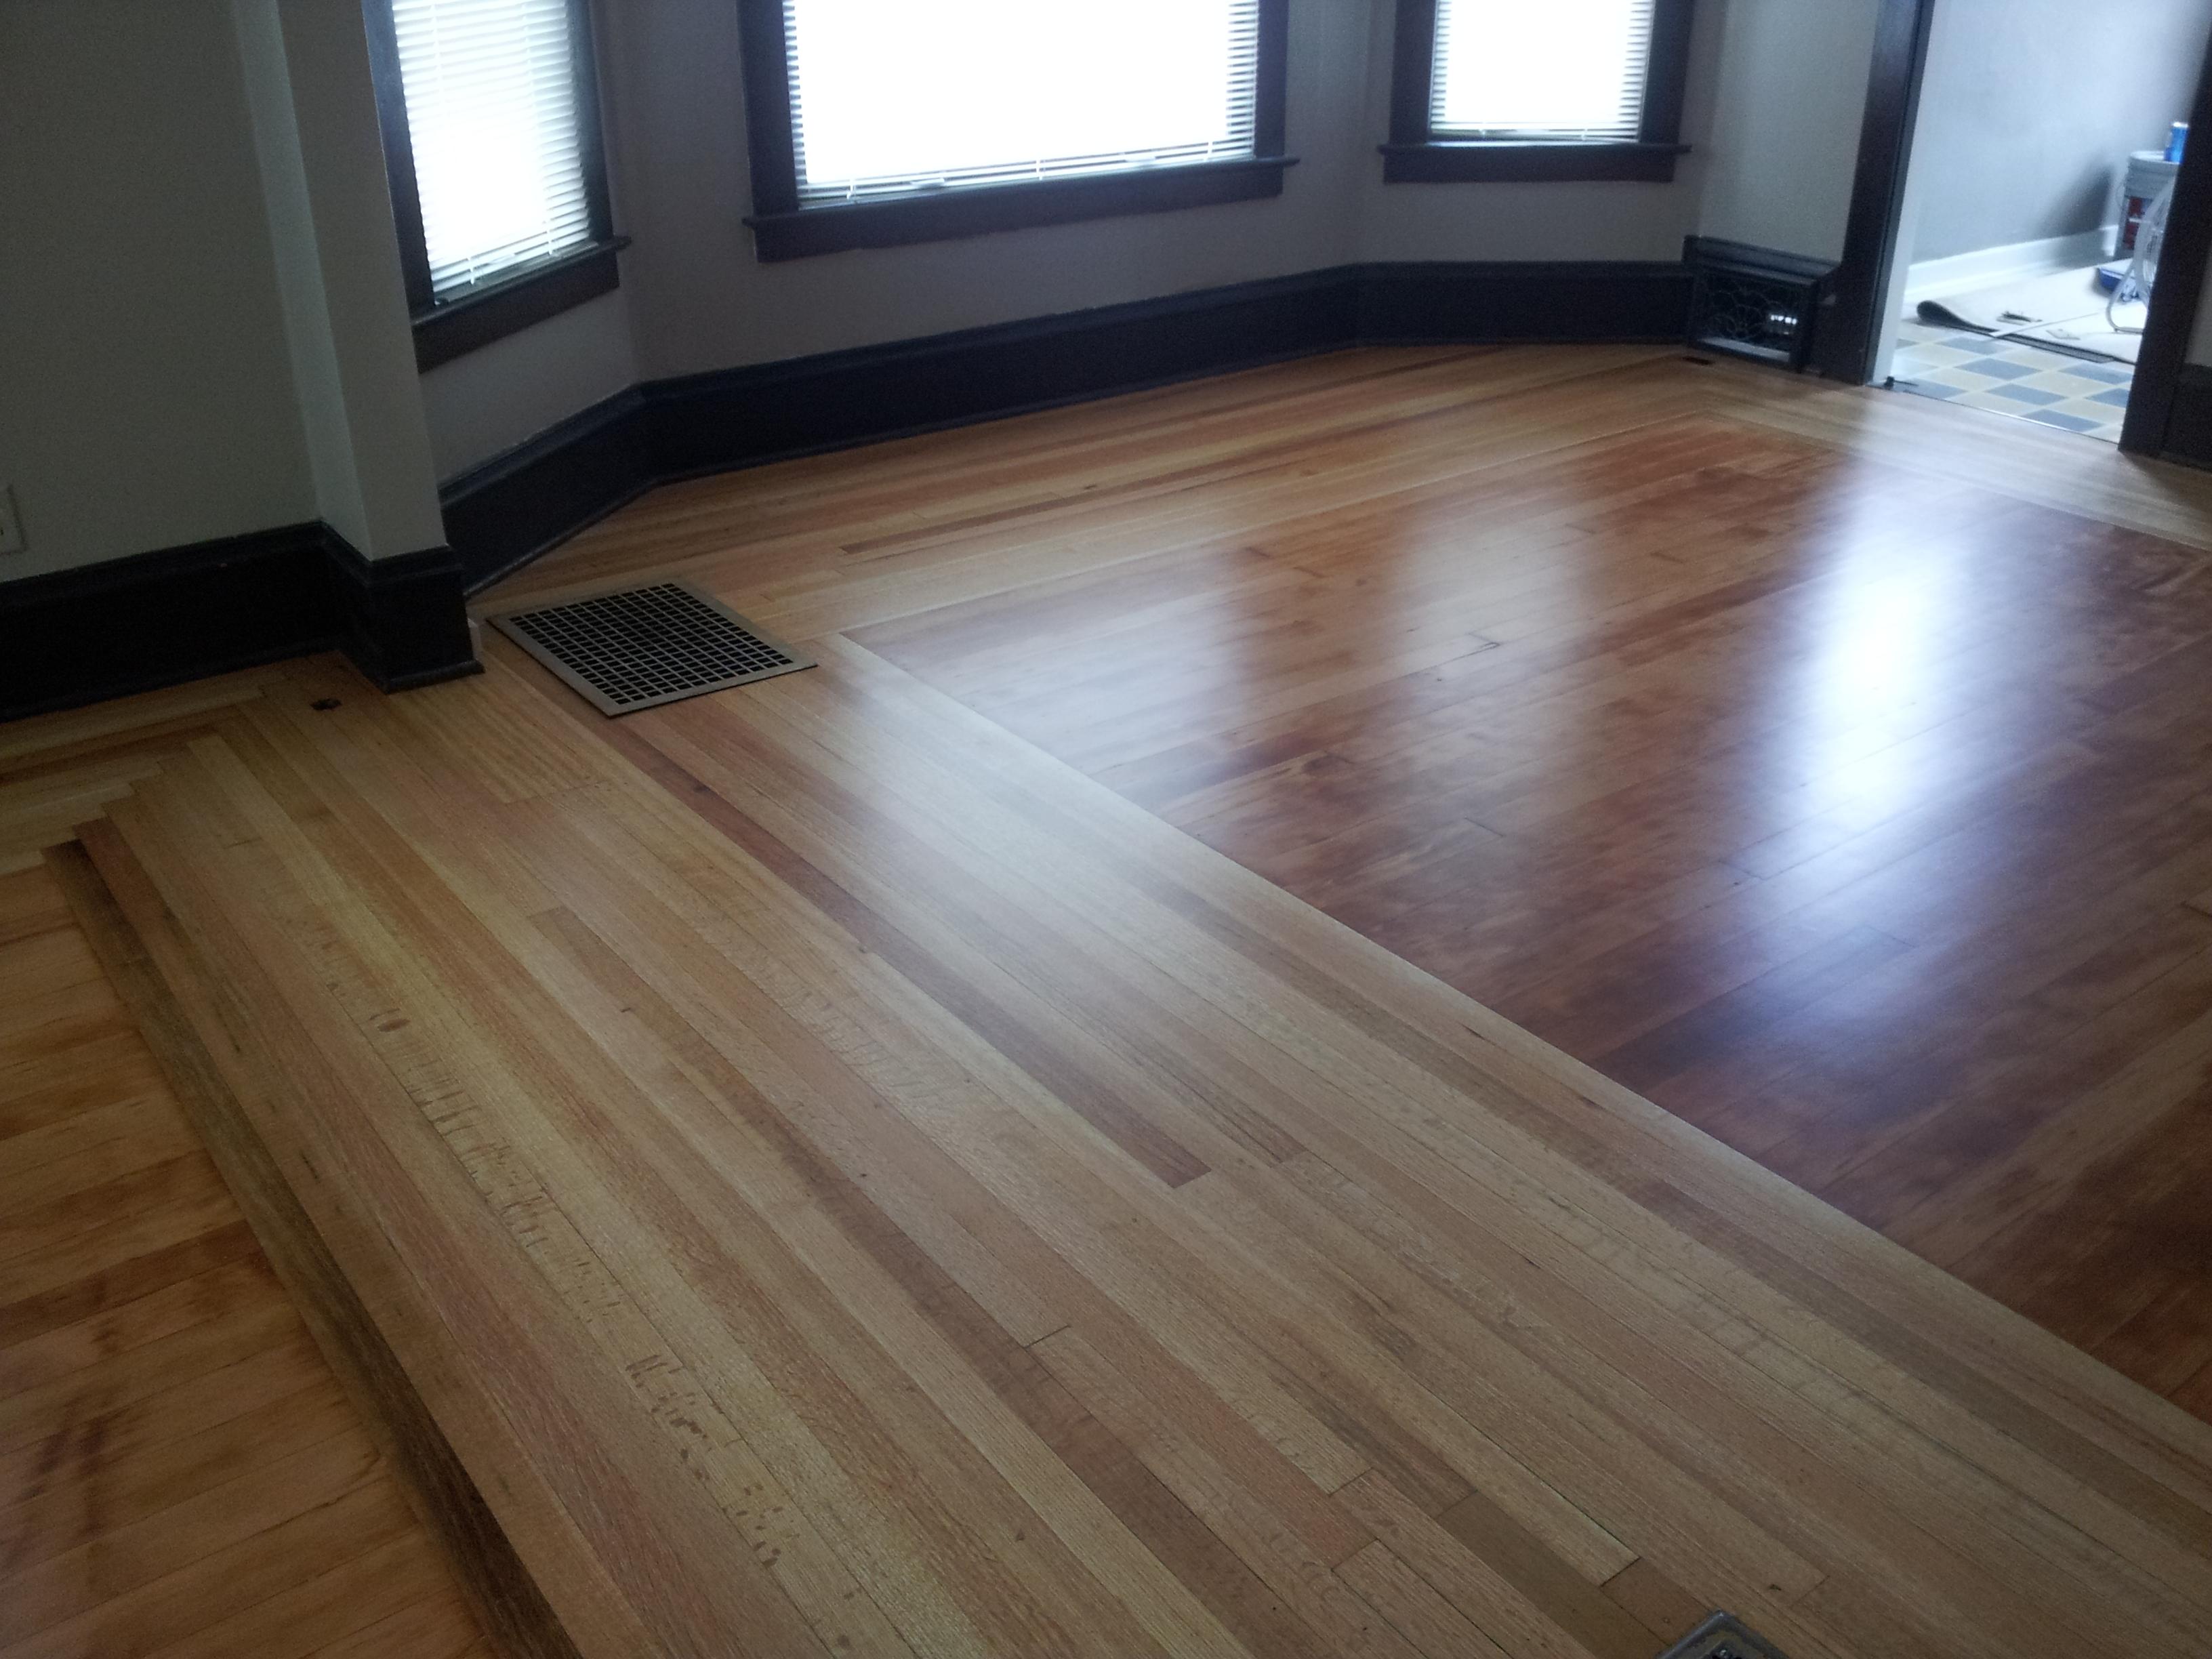 Hardwood flooring seattle hardwood floor refinishing and for Hardwood floors seattle